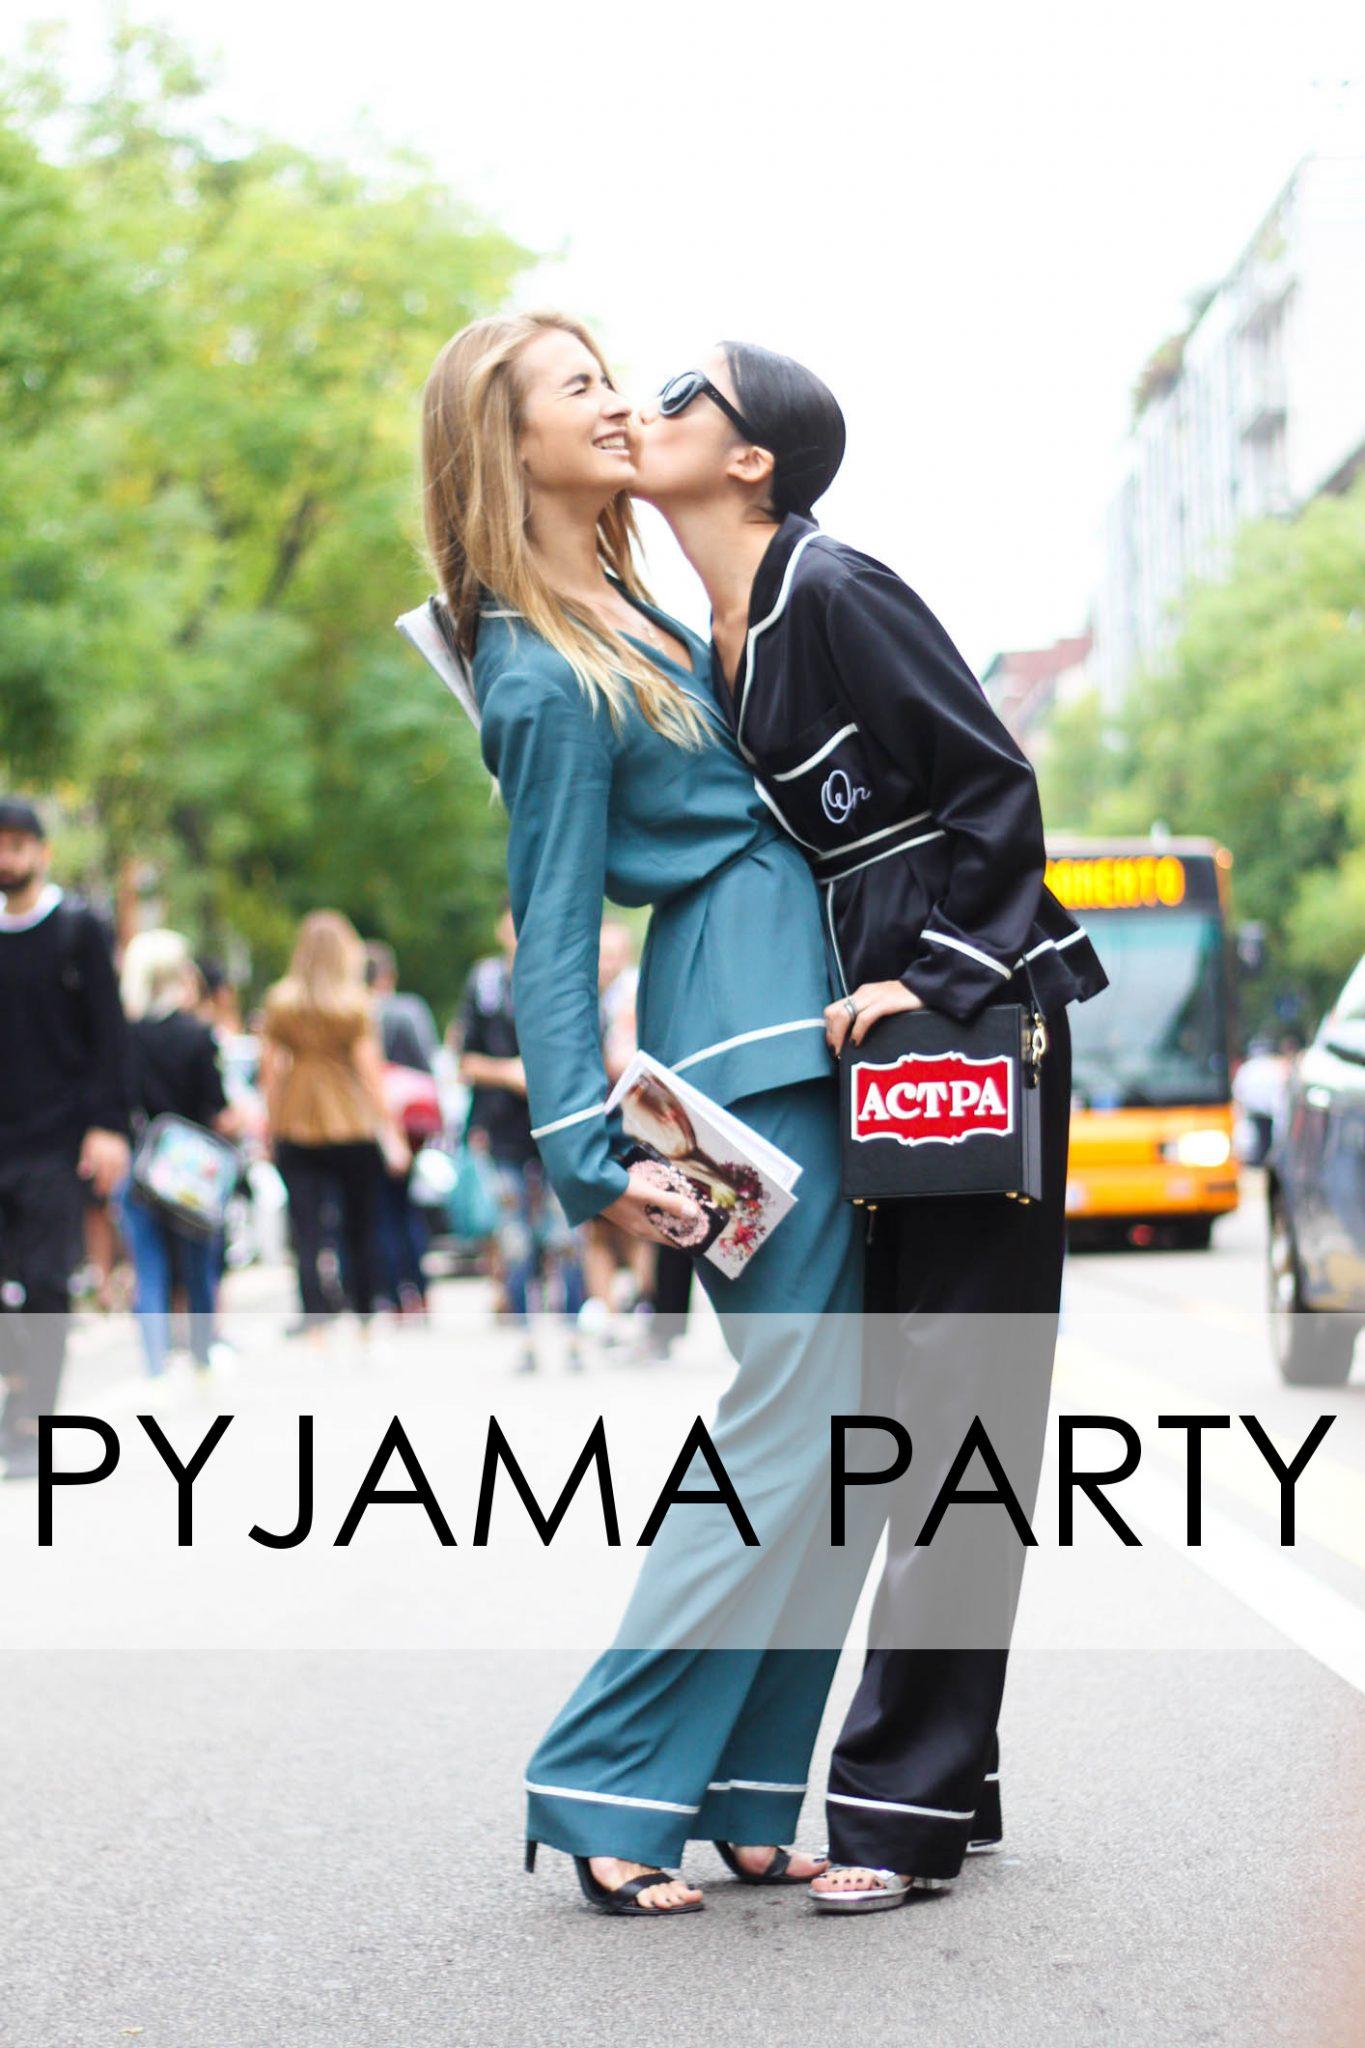 pajama party slide title